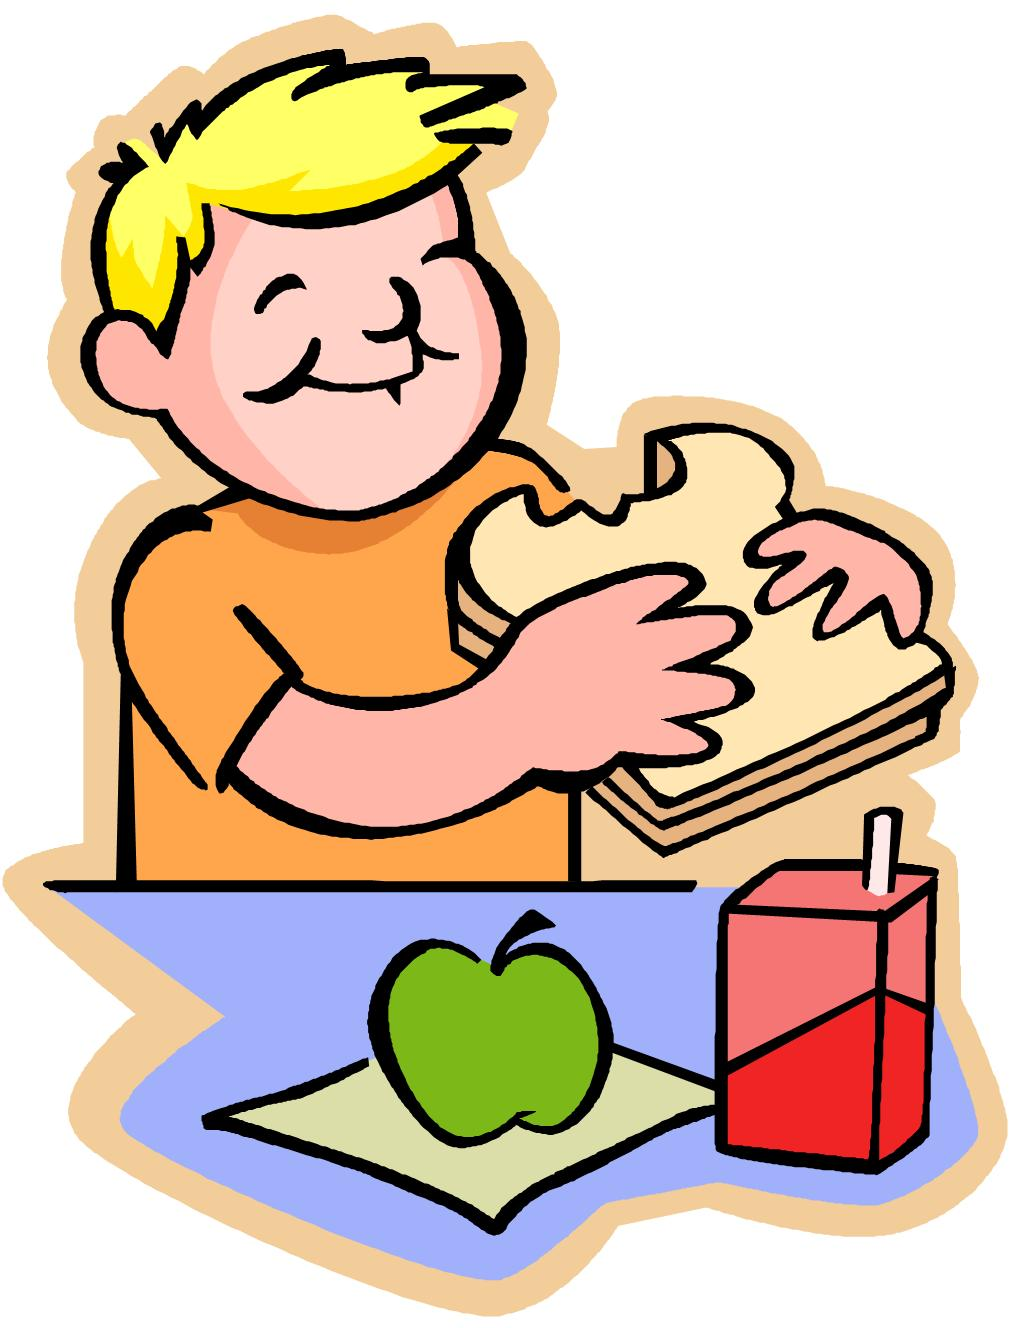 Class Party Clip Art School Health Clip -Class Party Clip Art School Health Clip Art Healthy Schools Lets Move-2